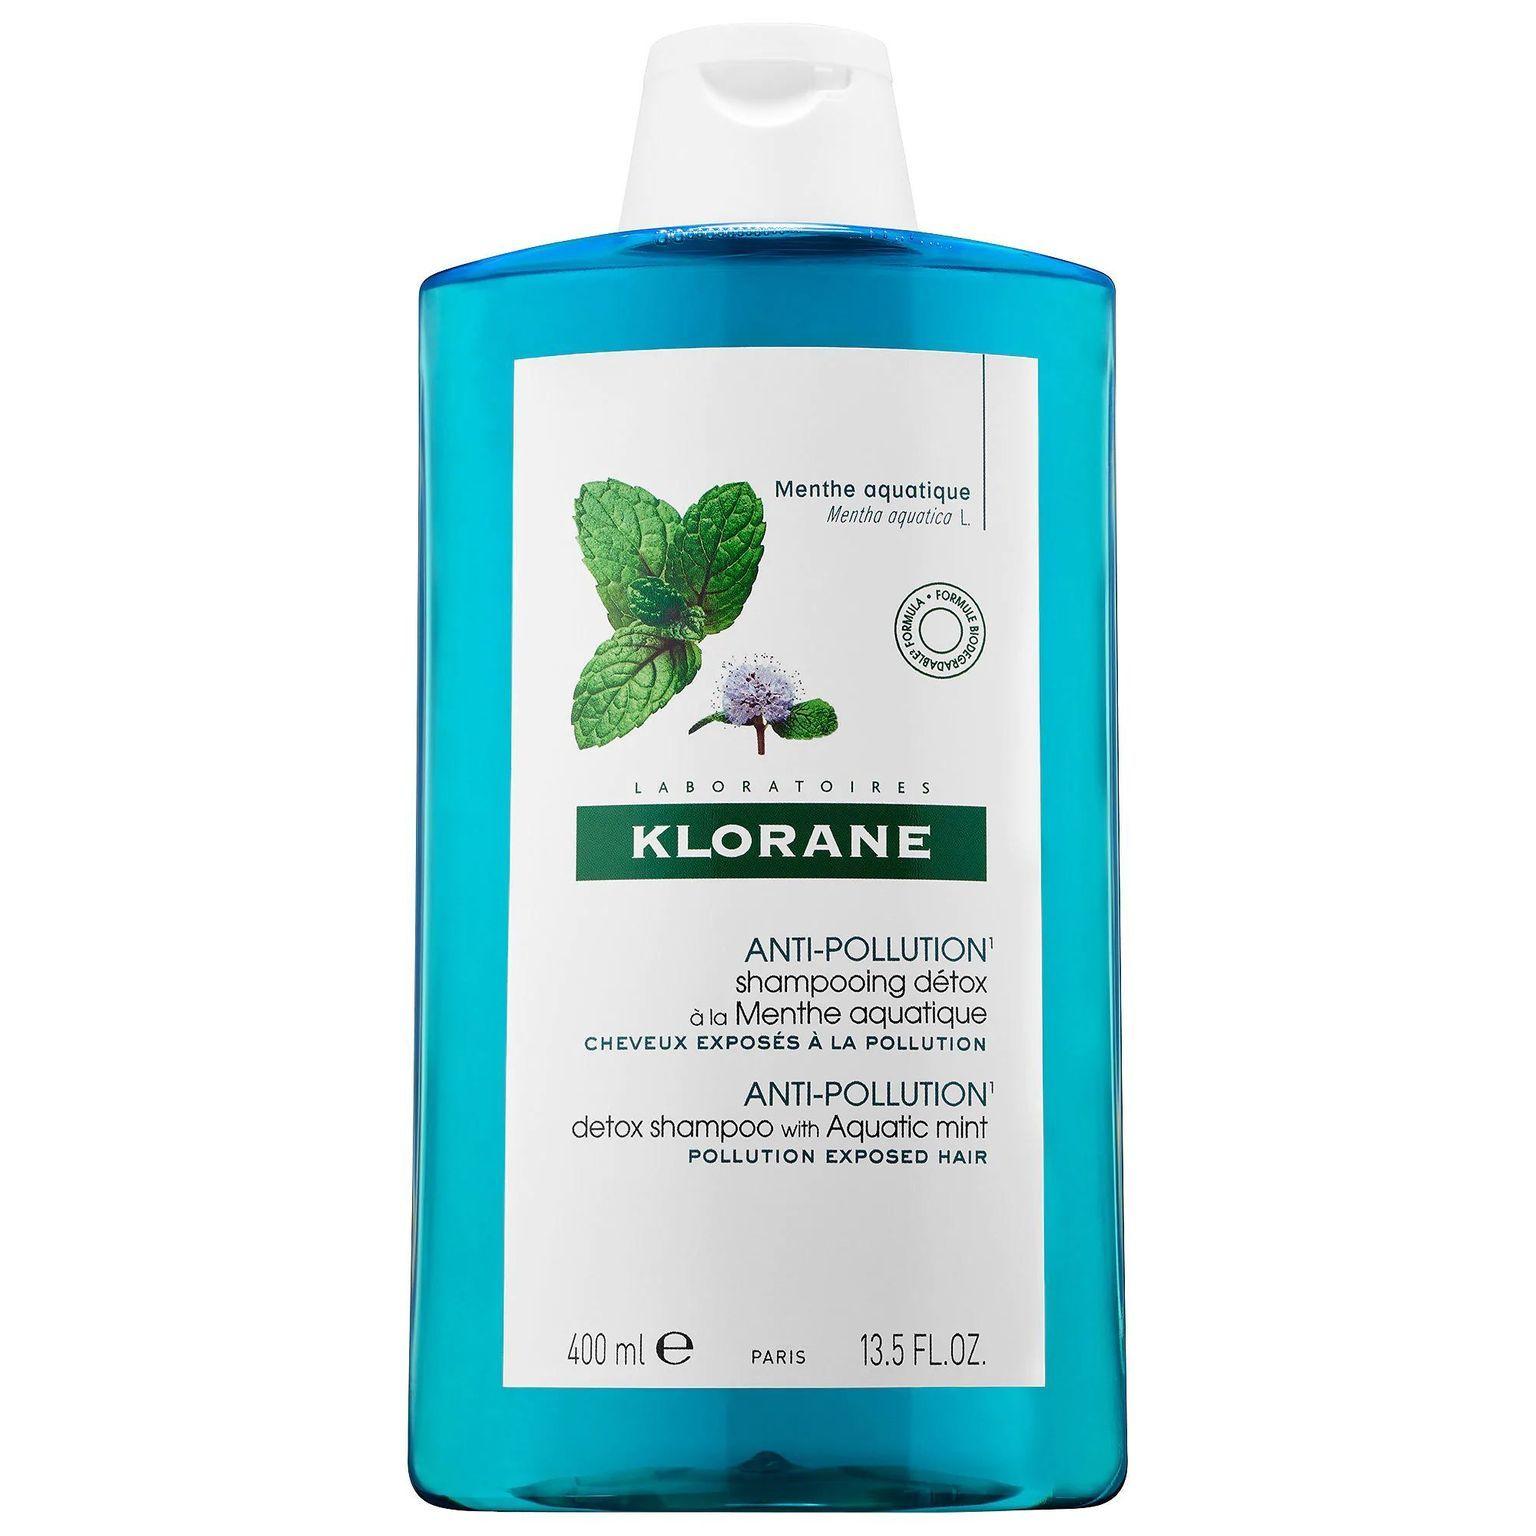 Anti-Pollution Detox Shampoo with Aquatic Mint